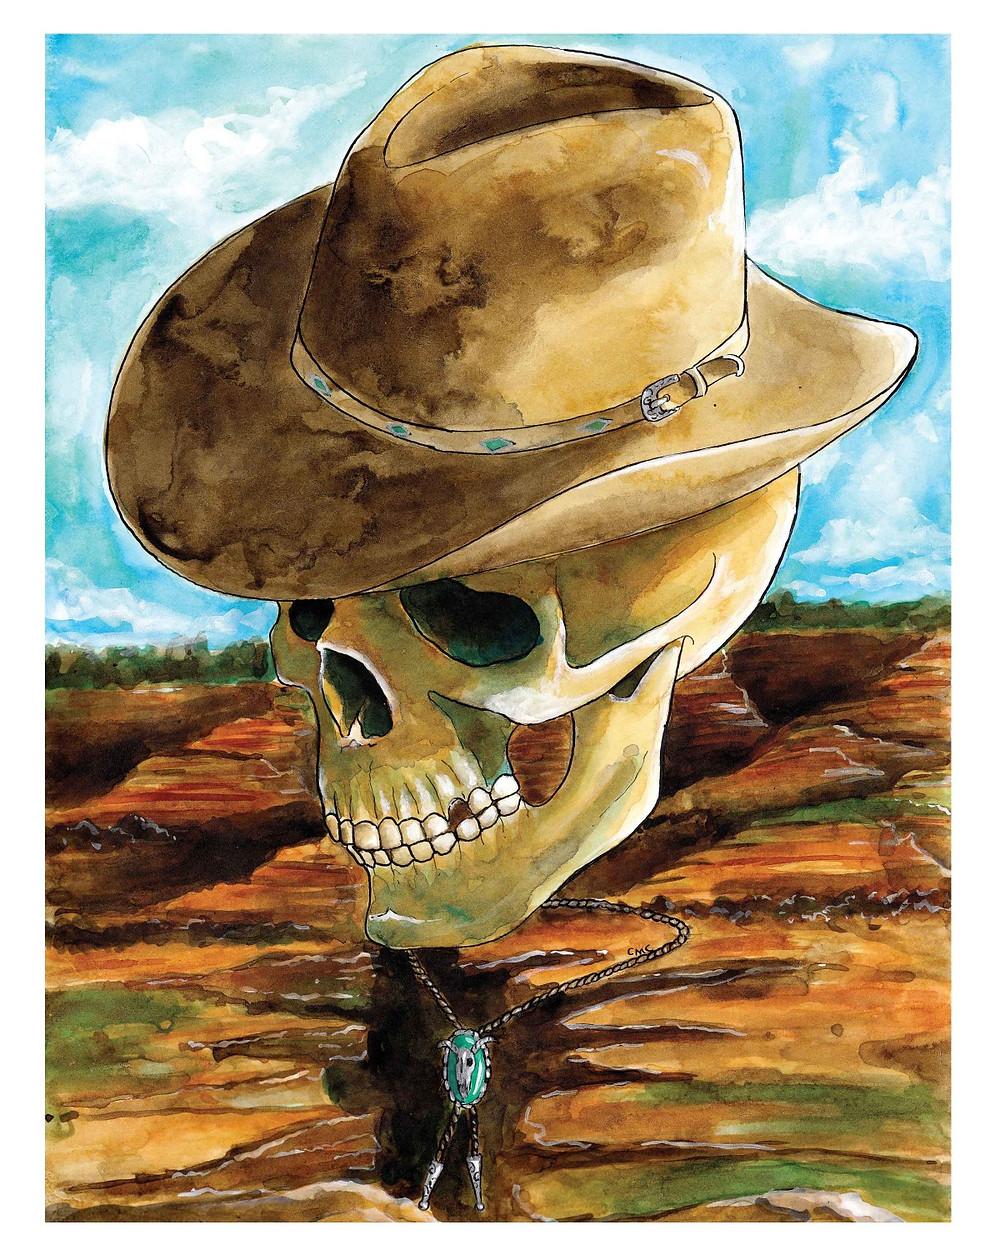 CountryMusicThemedSkull_CowboyHat_BolaTie_Mesa_Inkwashpainting